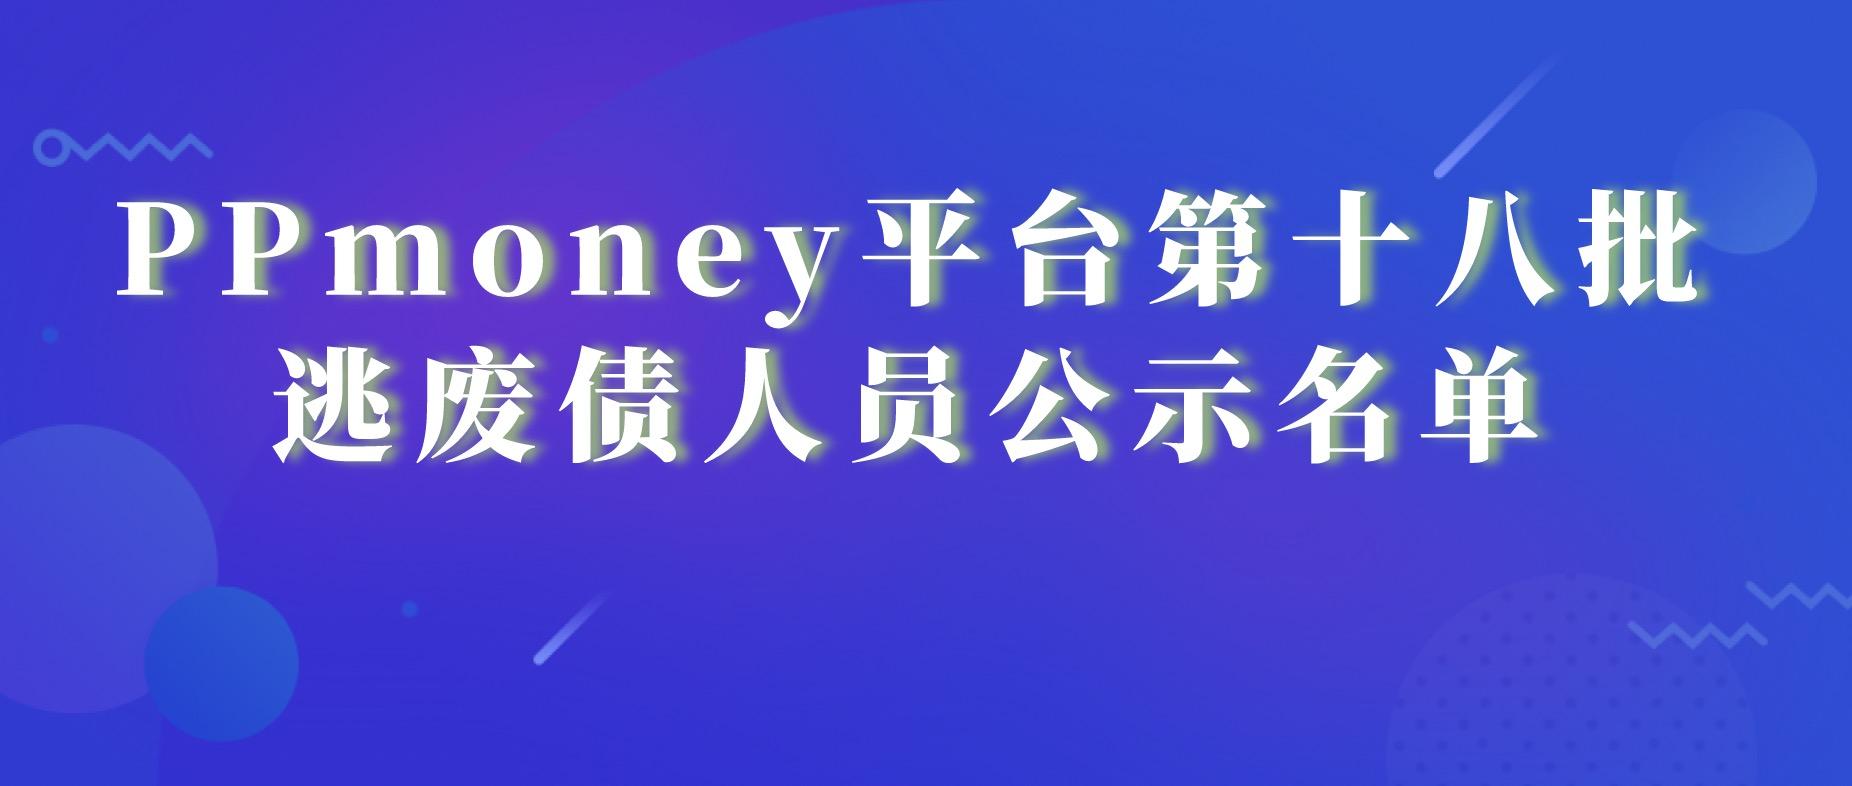 PPmoney平台第十八批逃废债人员公示名单